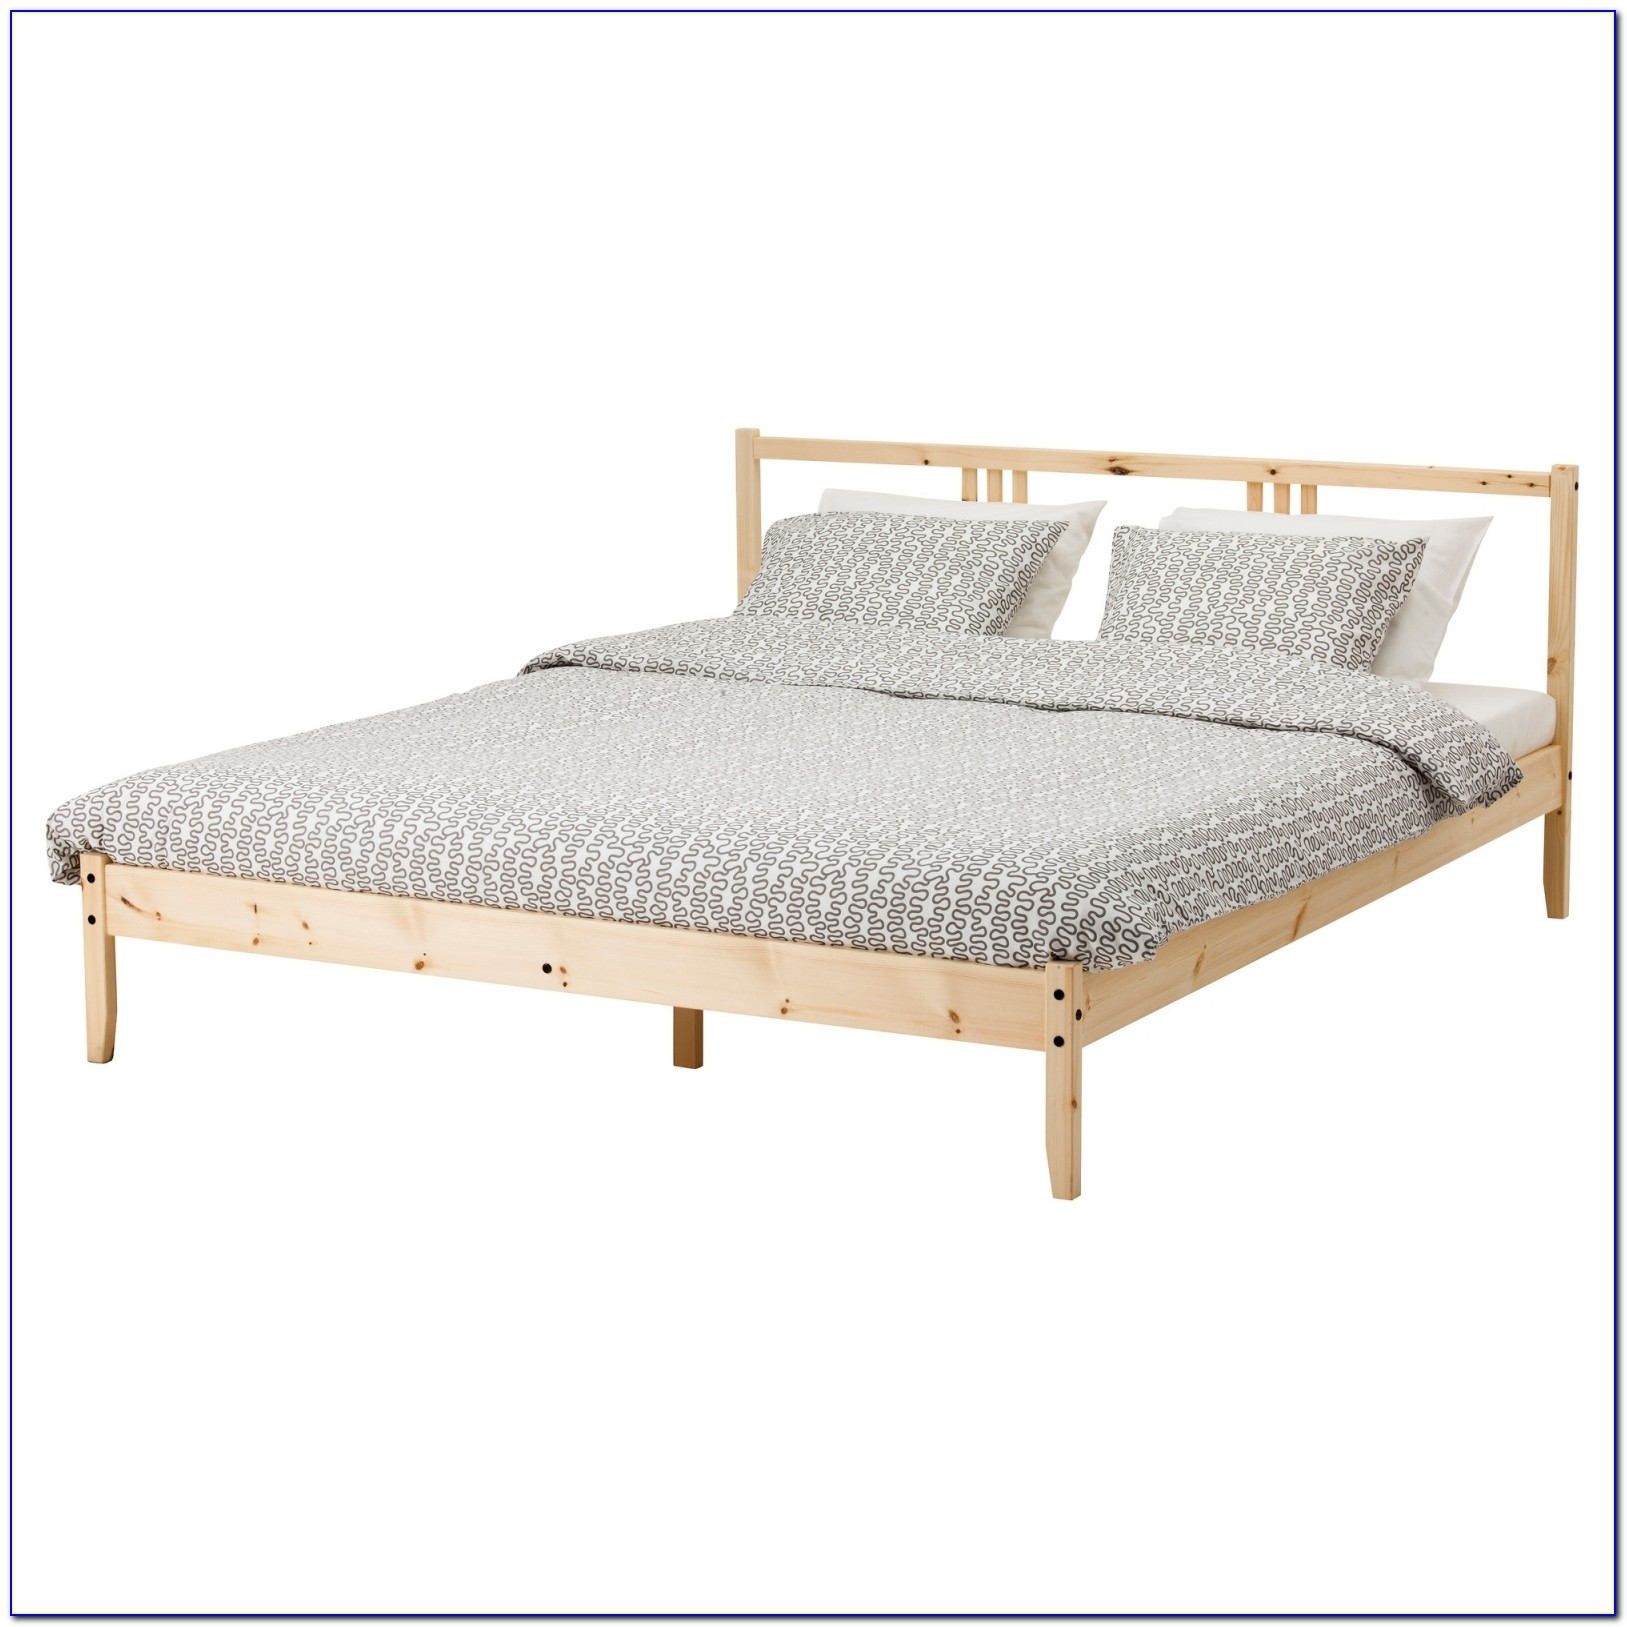 Fjellse Bed Frame Fulldouble Ikea Ikea Fjellse Bed Frame Ikea Fjellse Bed Frame